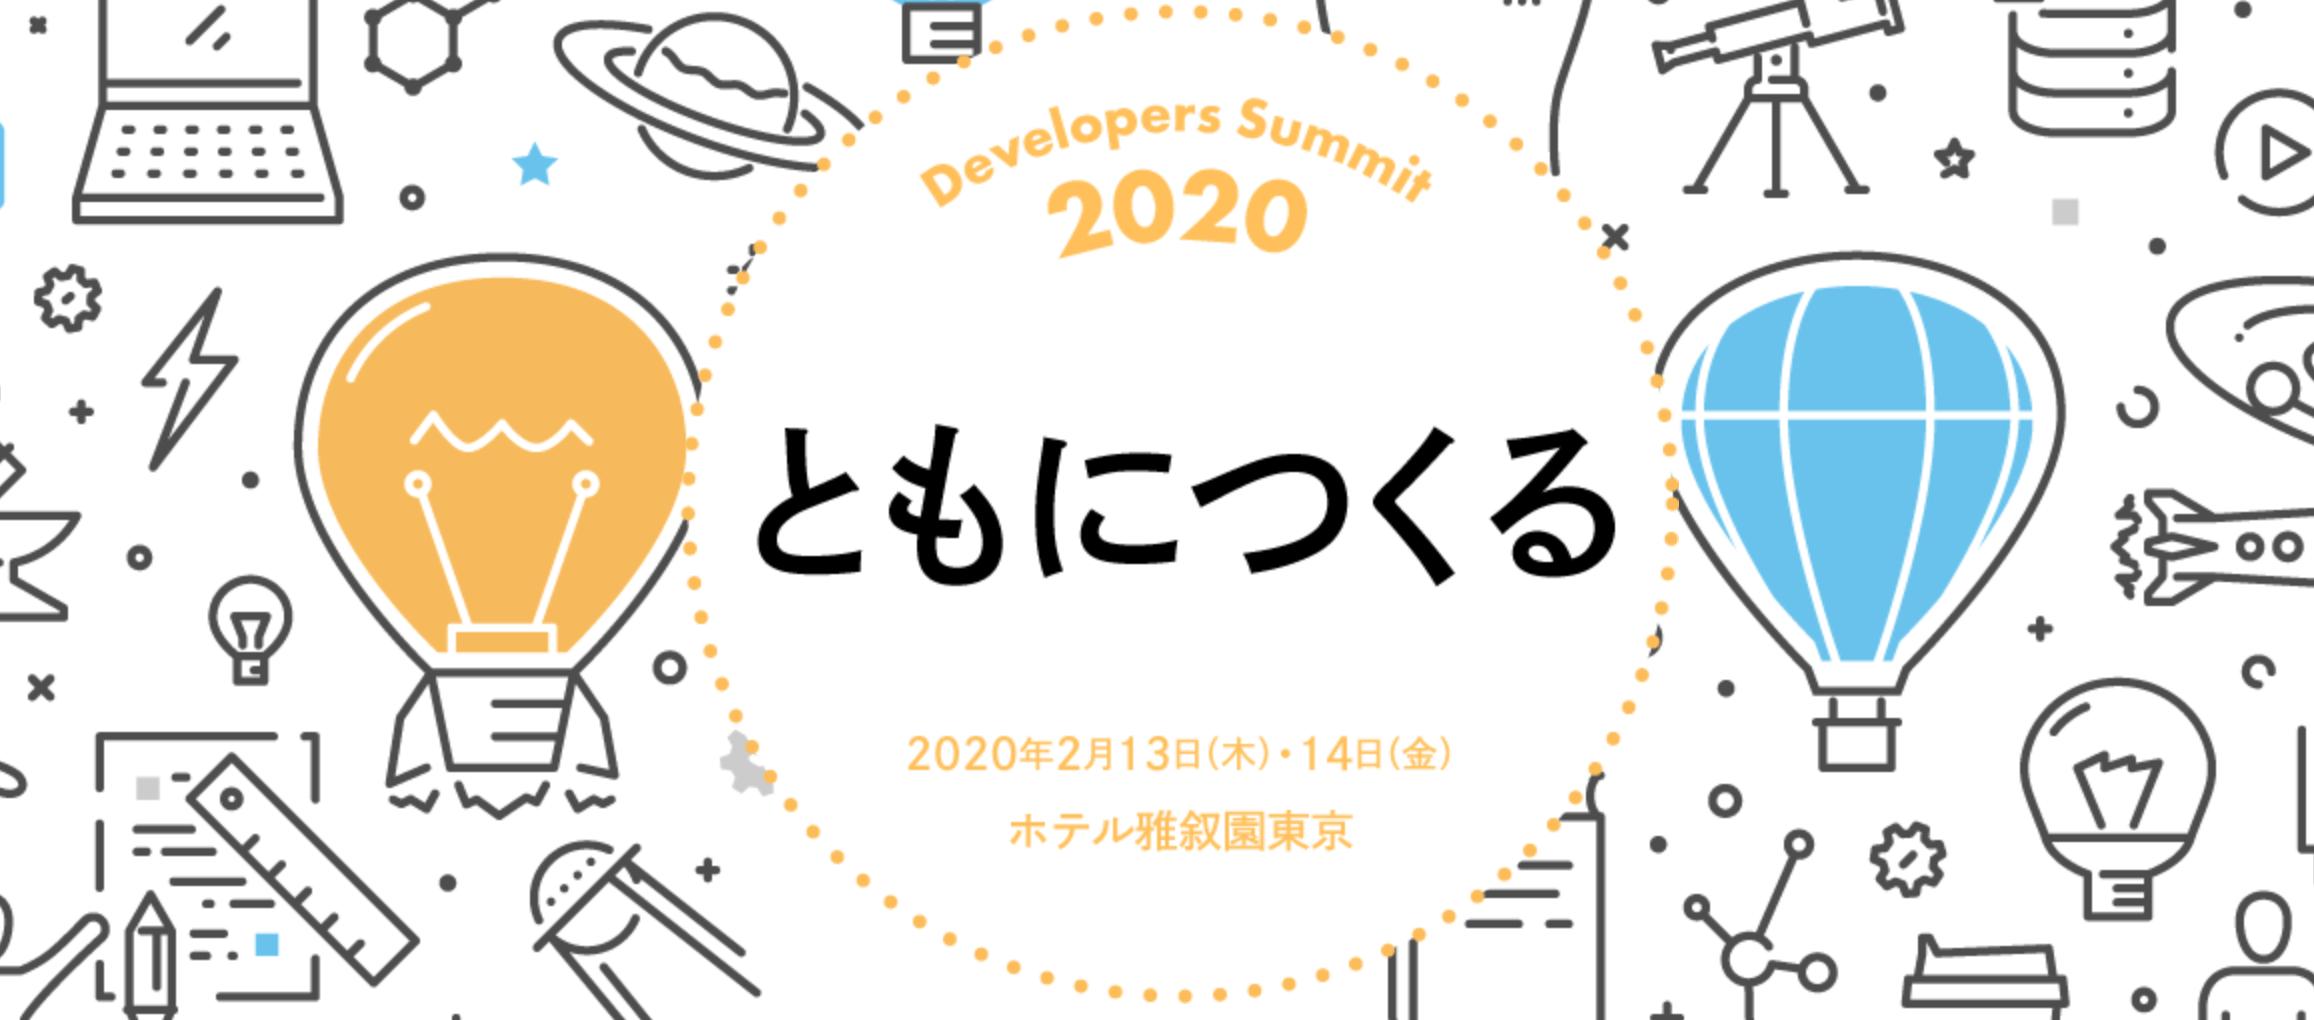 Developers Summit 2020に出展いたします #devsumi